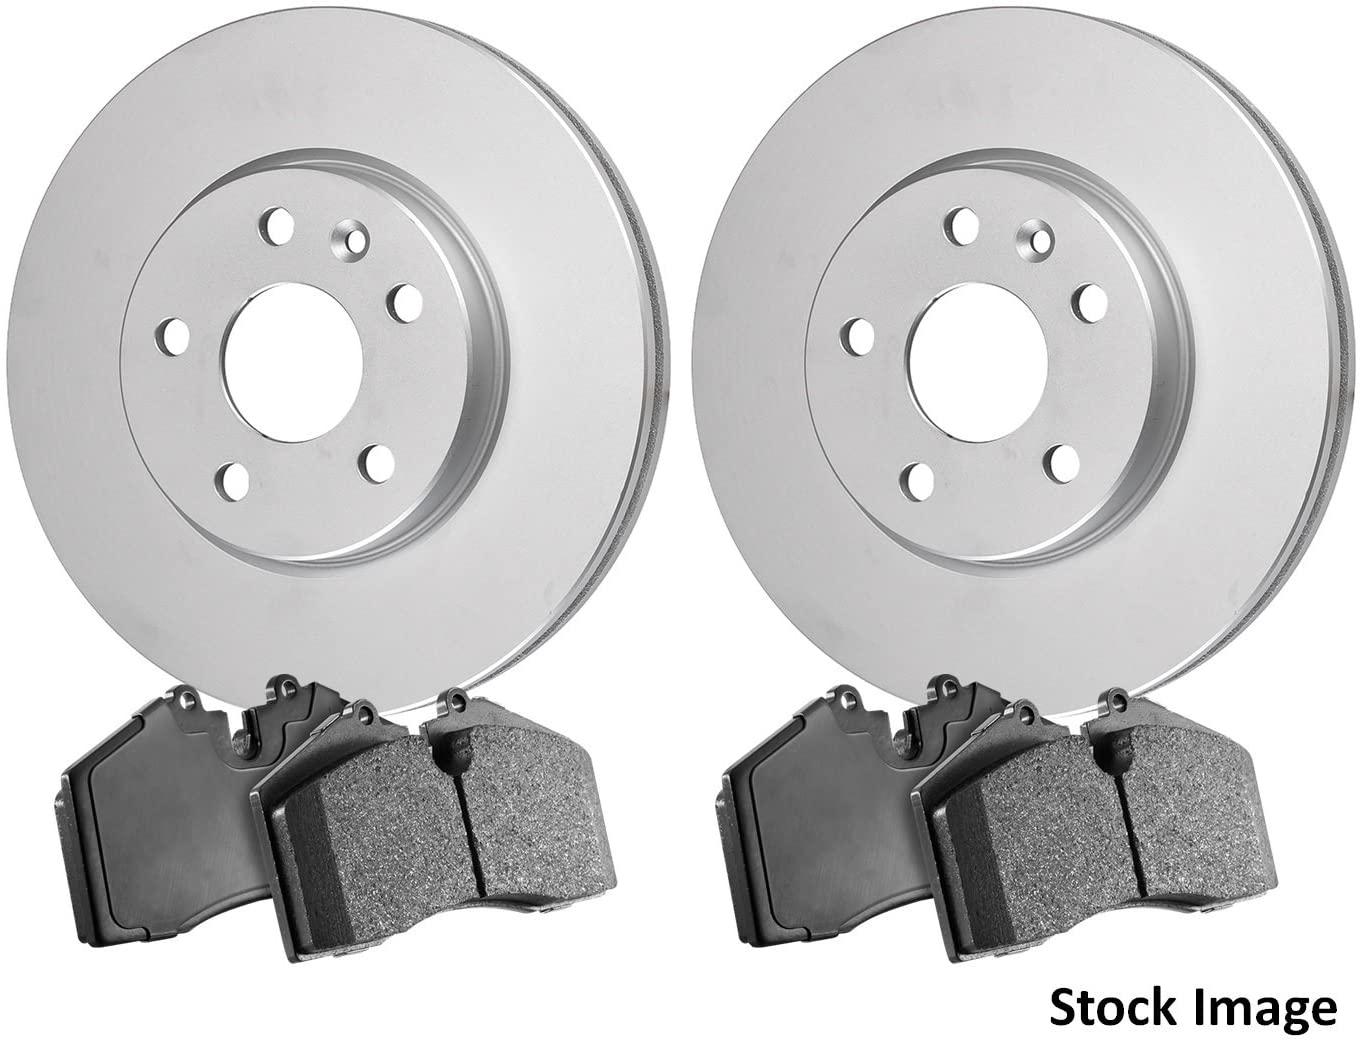 Stirling - 2008 For Mitsubishi Endeavor Front Anti Rust Coated Disc Brake Rotors and Ceramic Brake Pads